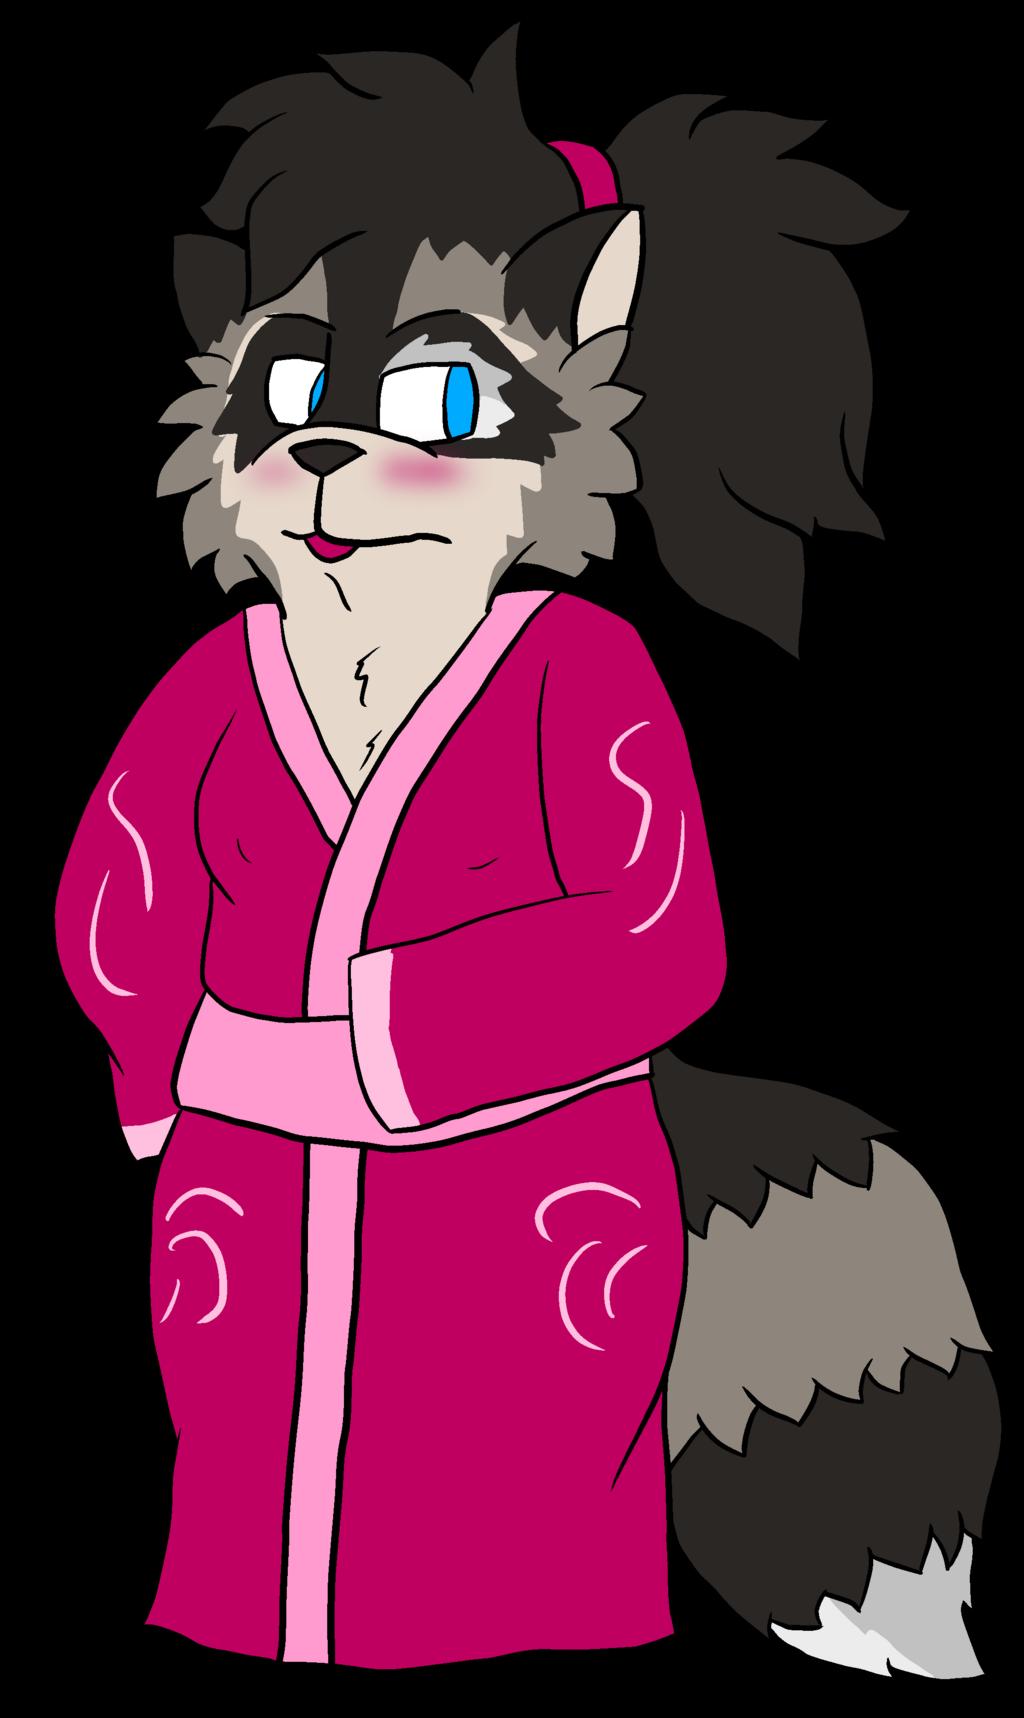 Most recent image: Keiko (Geisha)